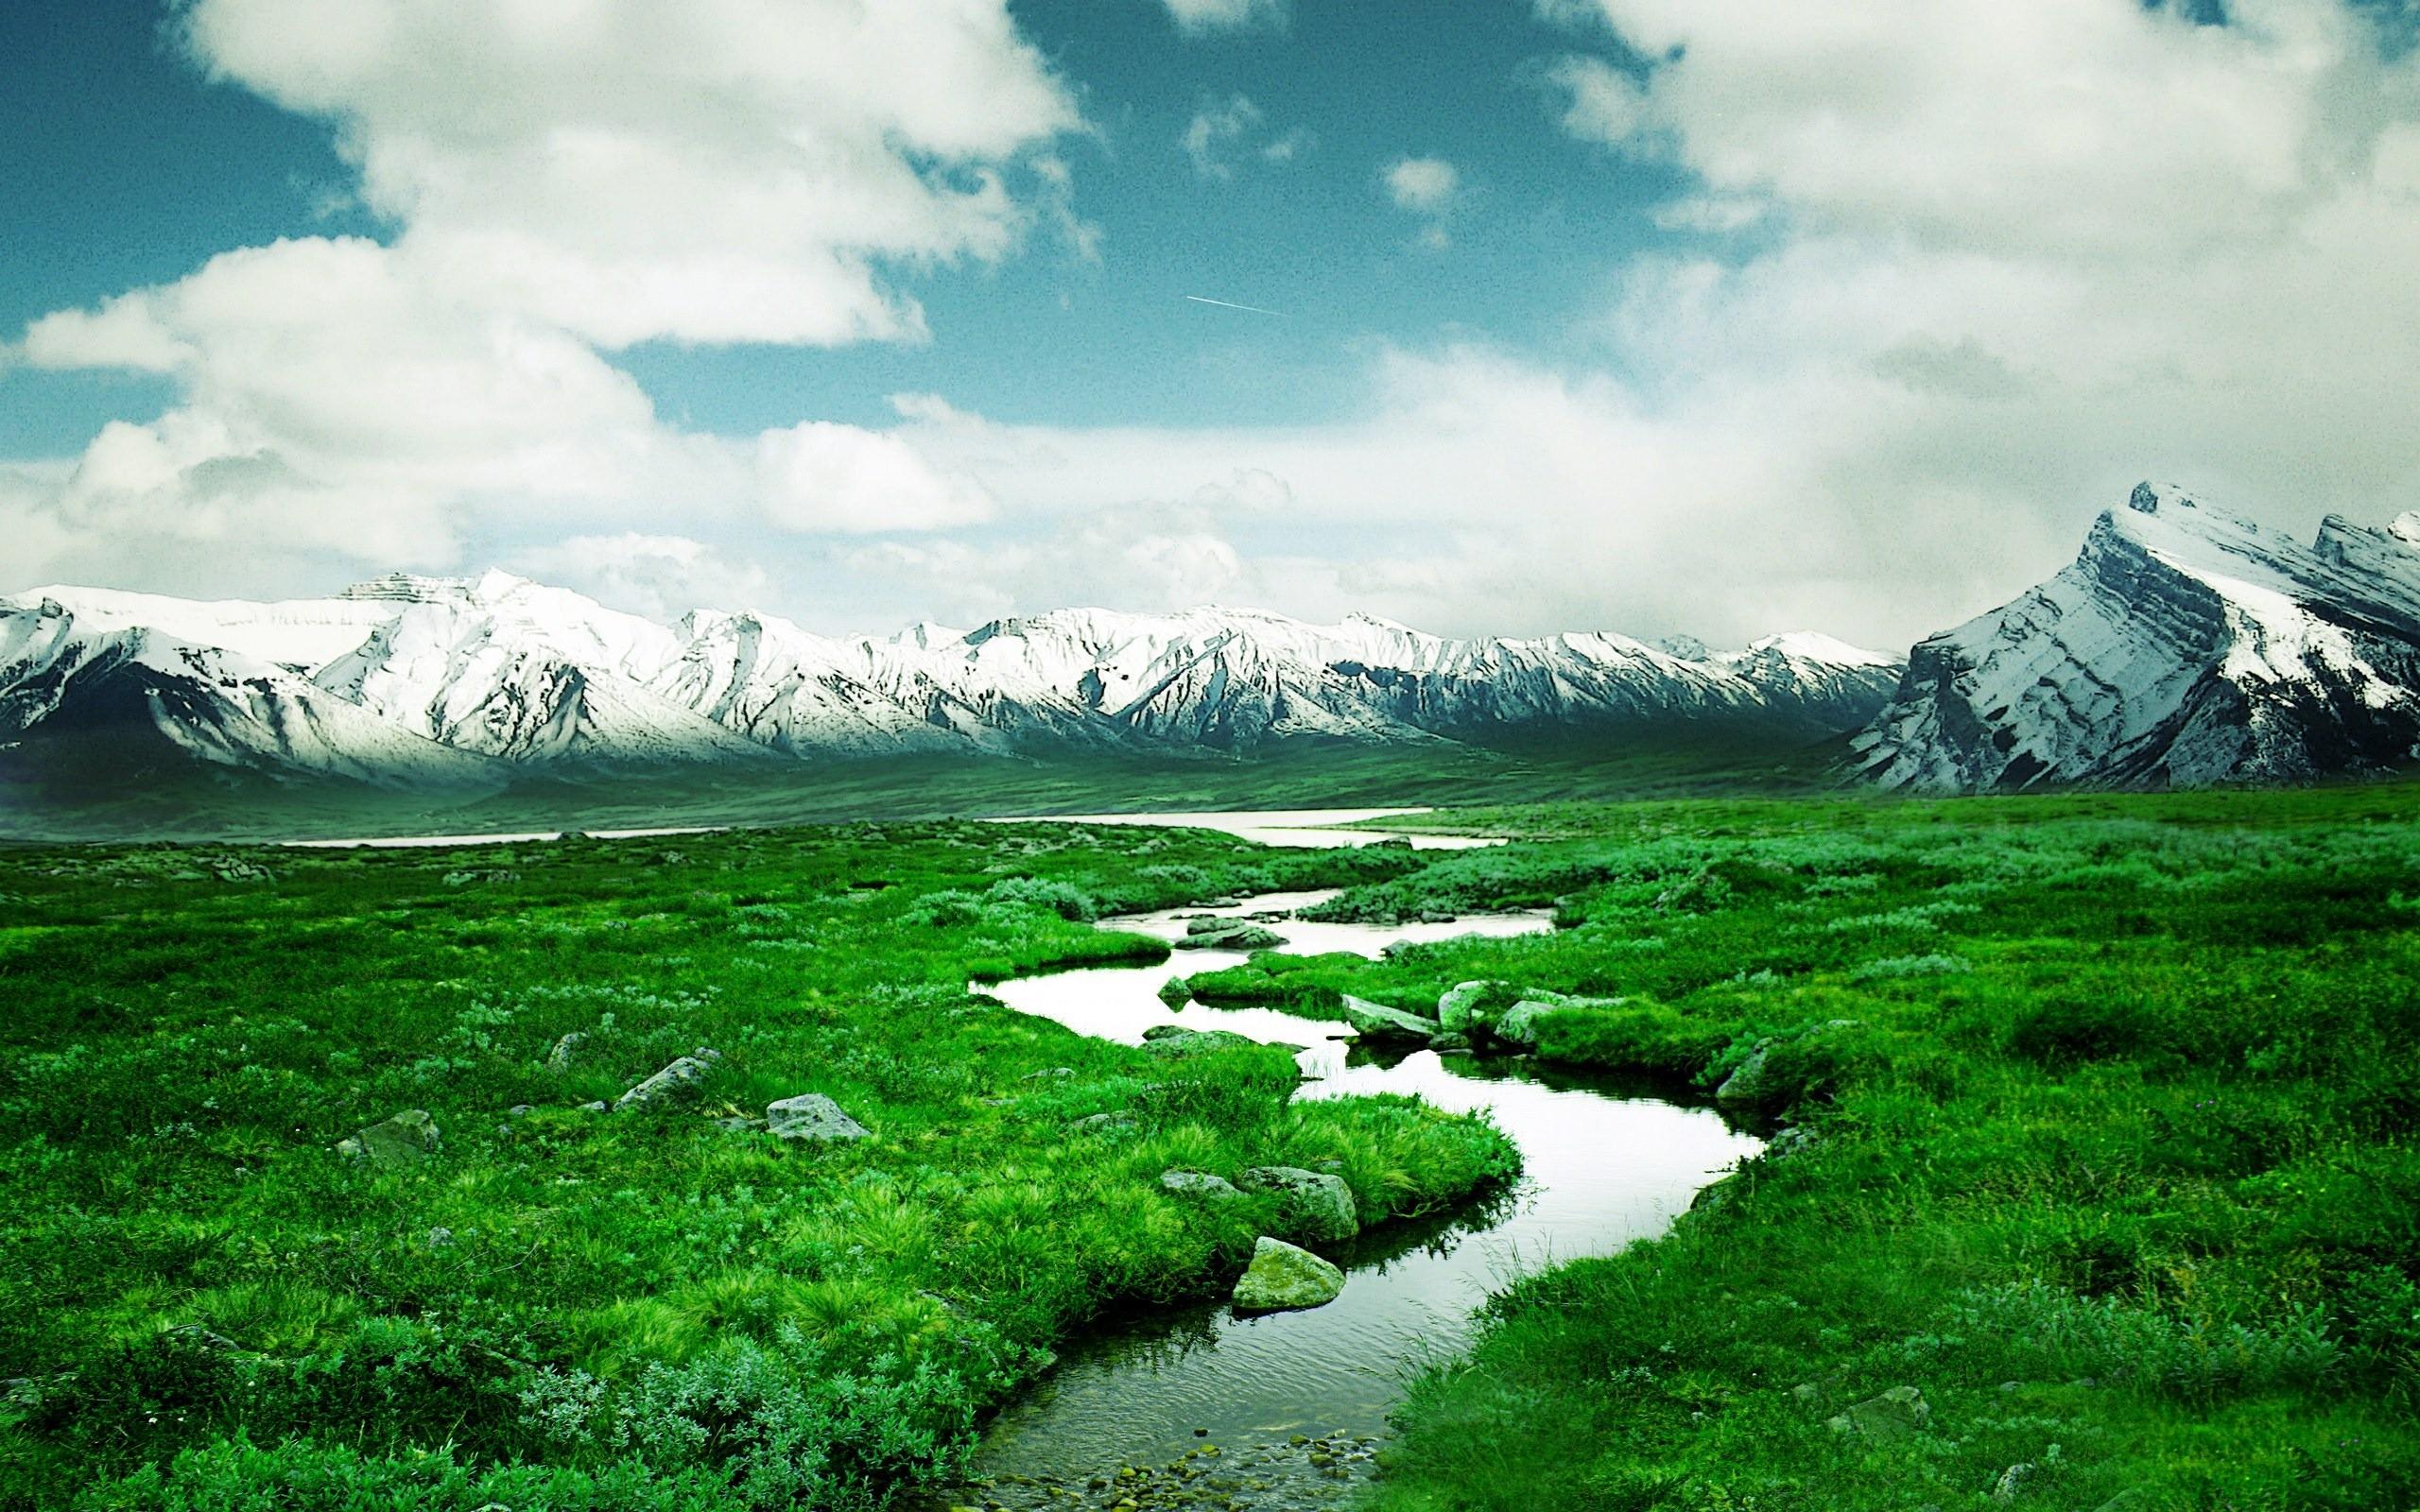 hd desktop wallpaper ·① download free high resolution wallpapers